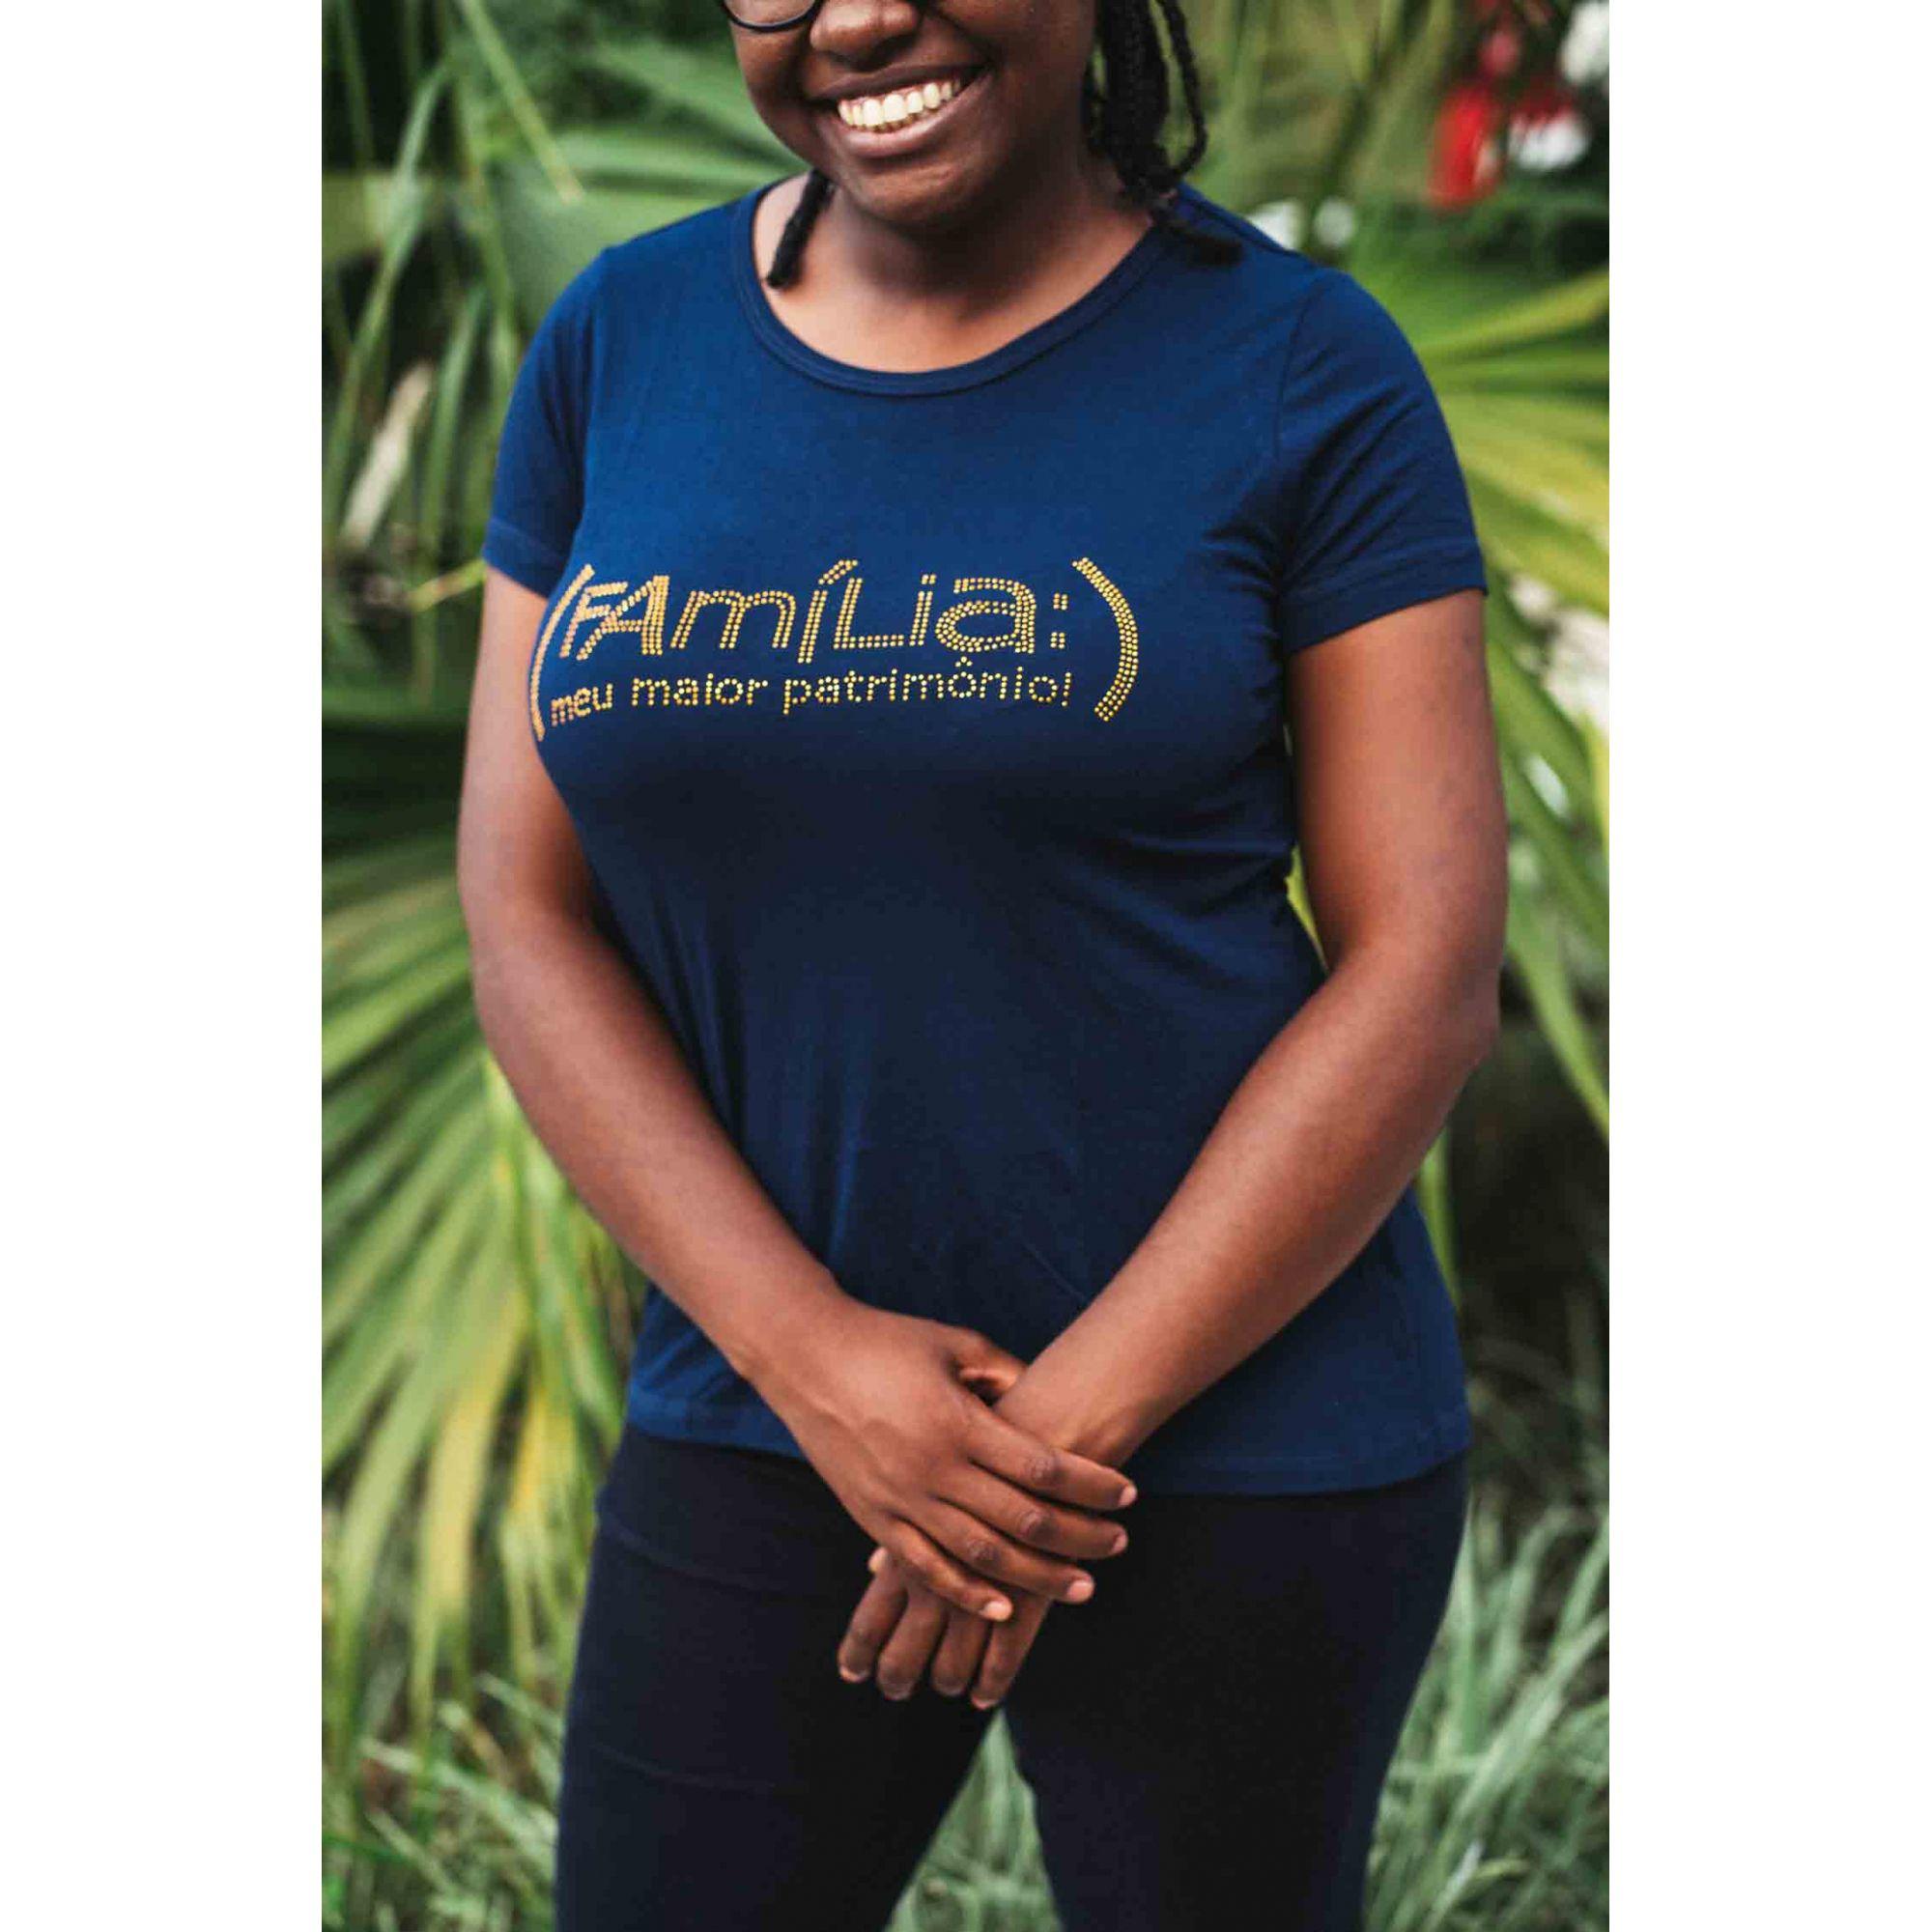 Camiseta Família Meu maior patrimônio feminina - azul  - Loja Amo Família